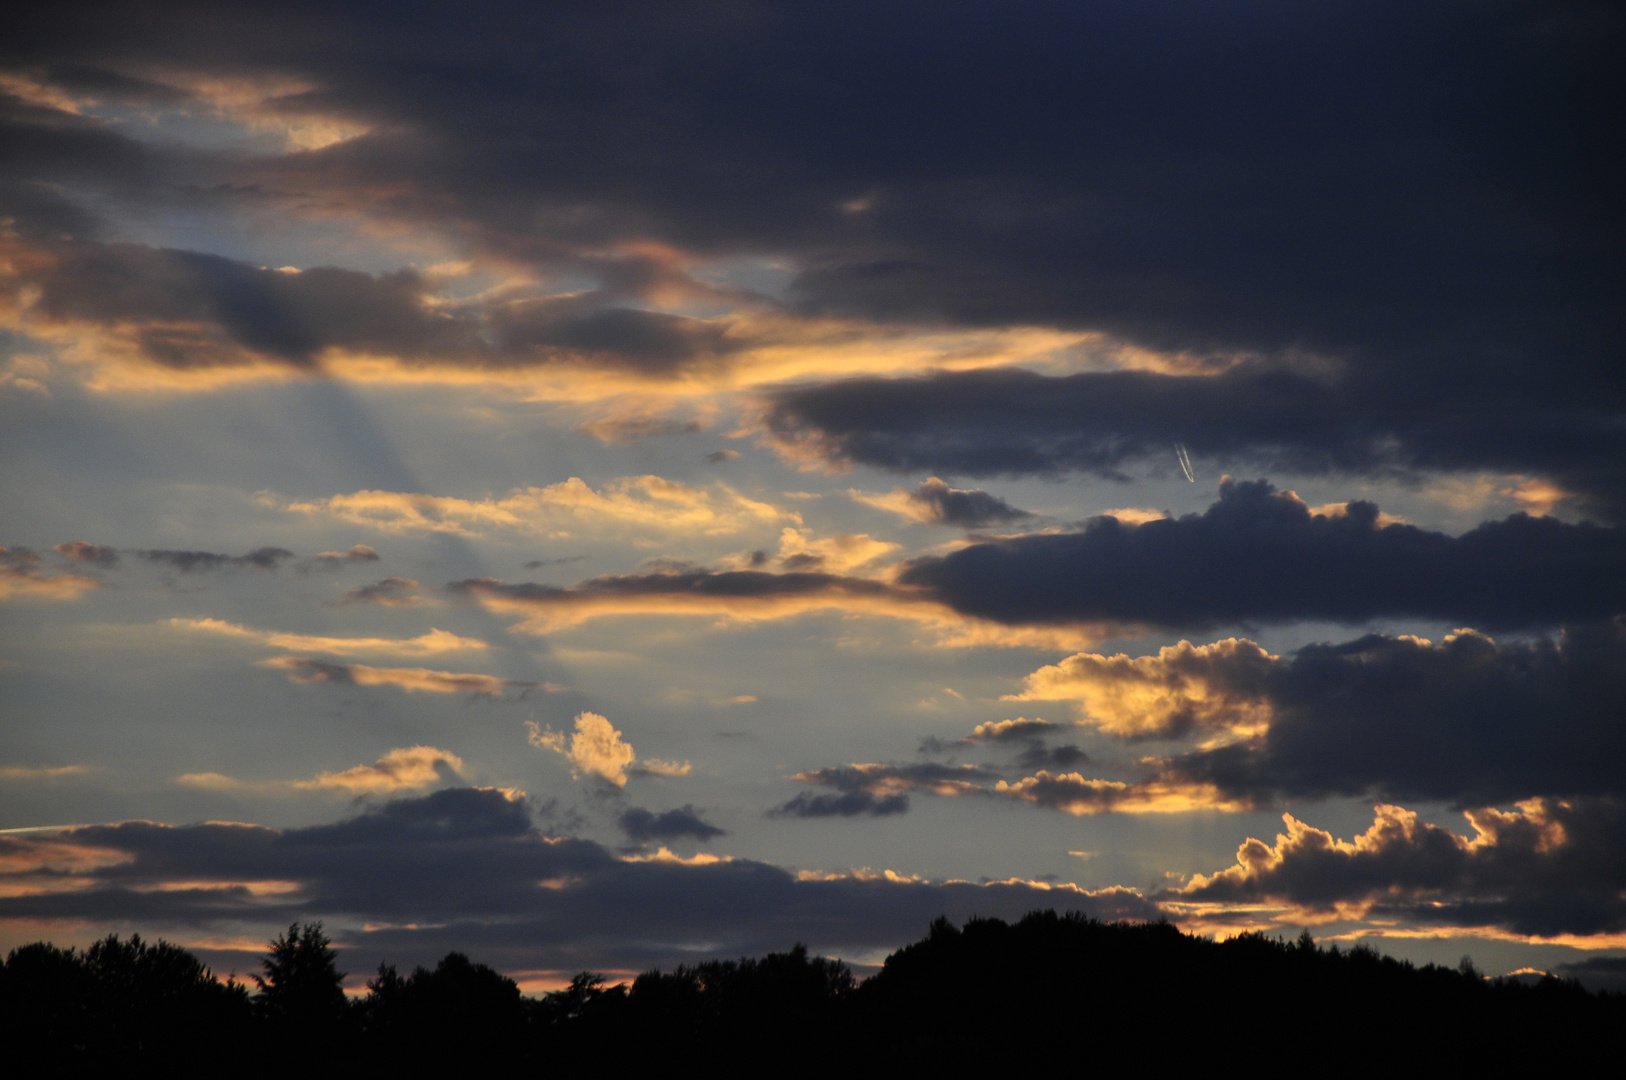 Sunset im Herbst